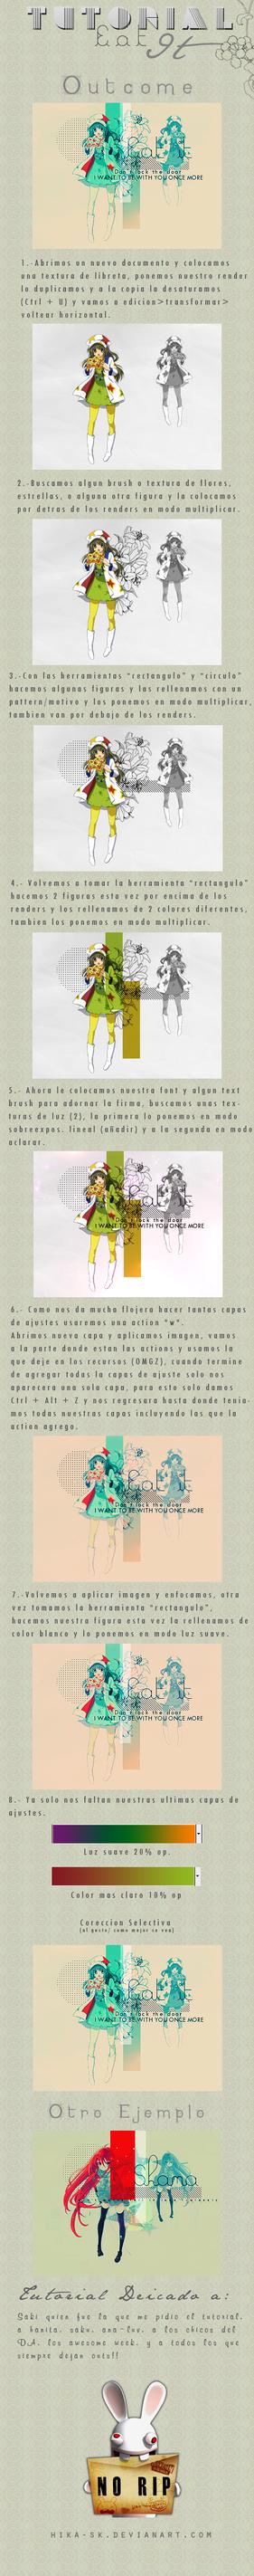 Un Tuto con Texturas by Hika-sk